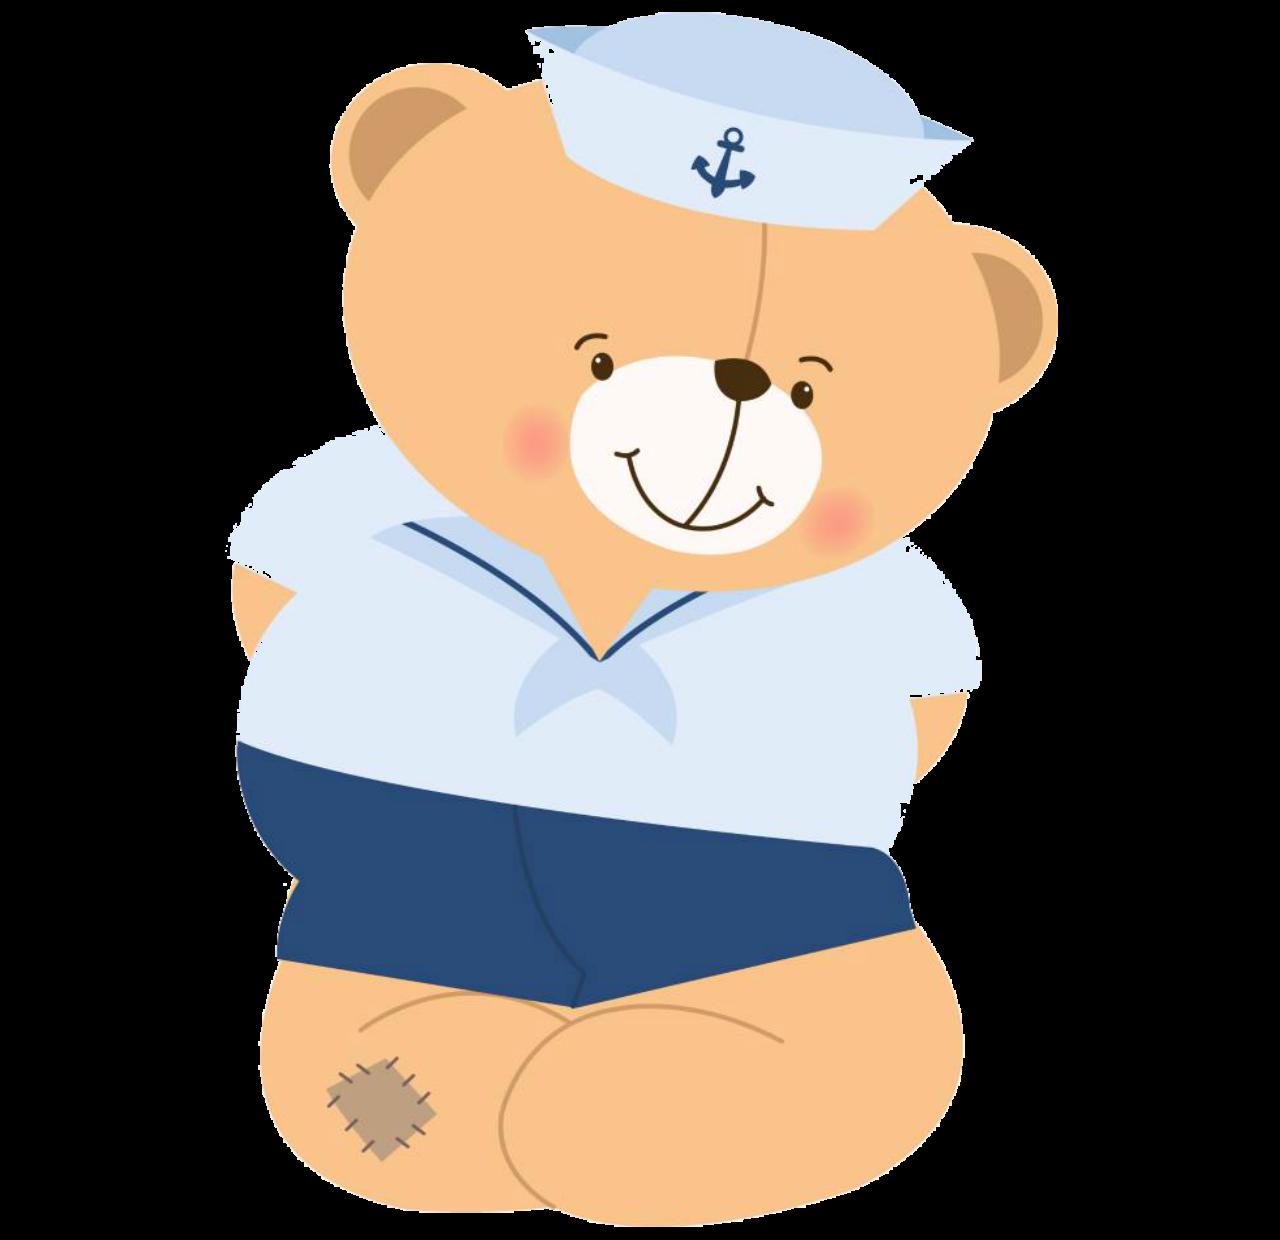 Lady clipart sailor. Bear pretty png sailorbearprettyclipartpng